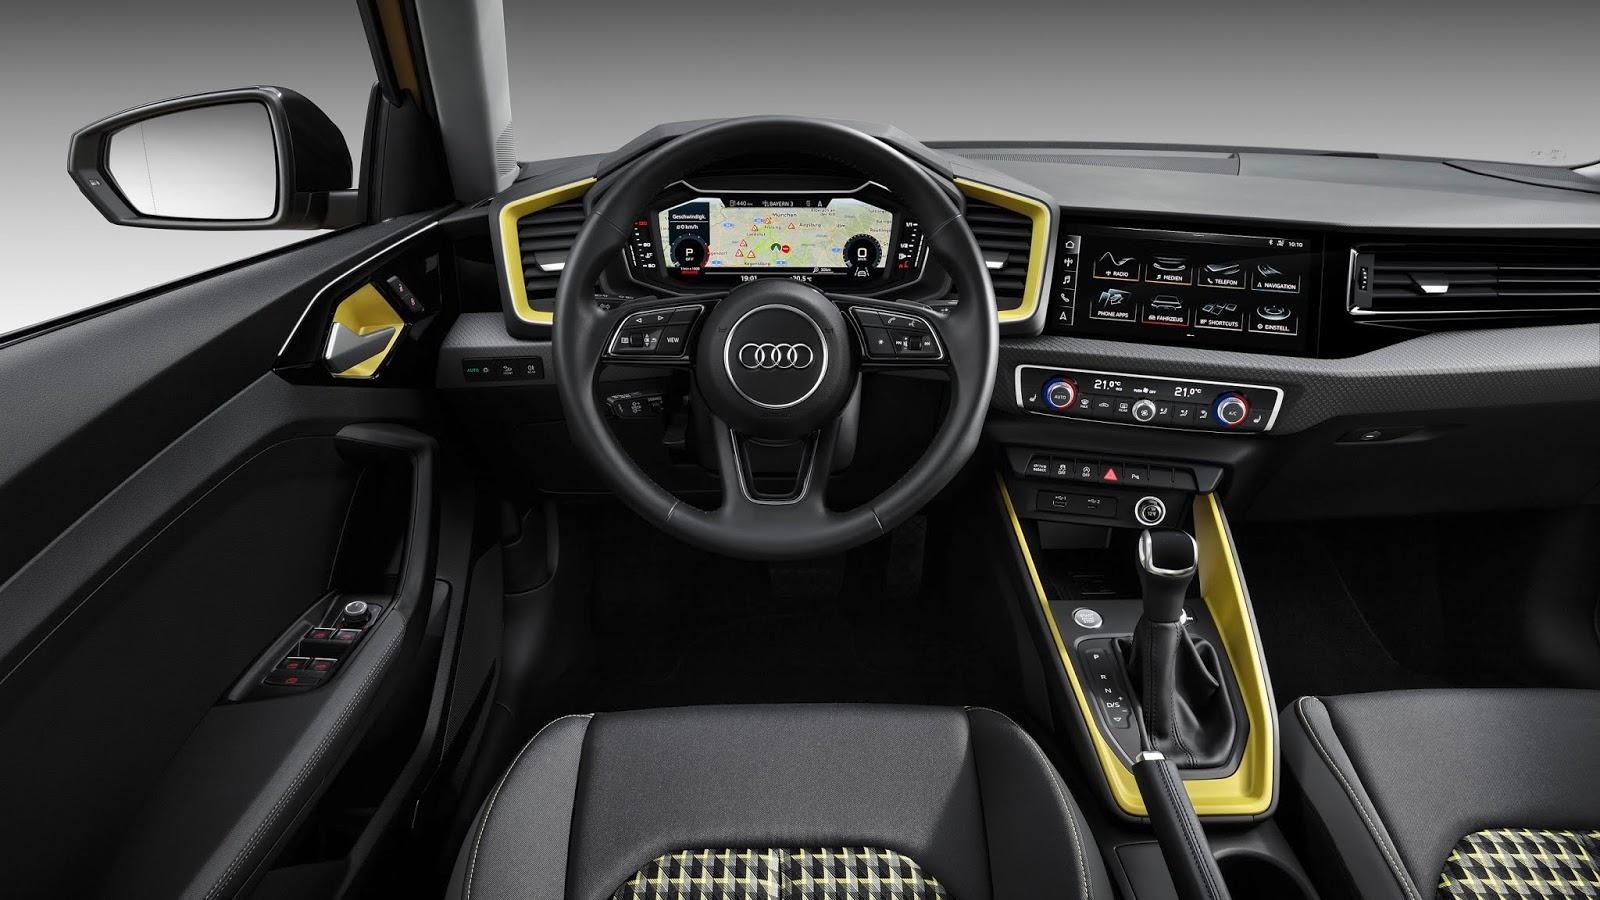 NEO2BAUDI2BA1 interior Από πού θα περάσει το Audi On Tour Audi, Audi R8, Kosmocar, καινούρια, Καρέντα